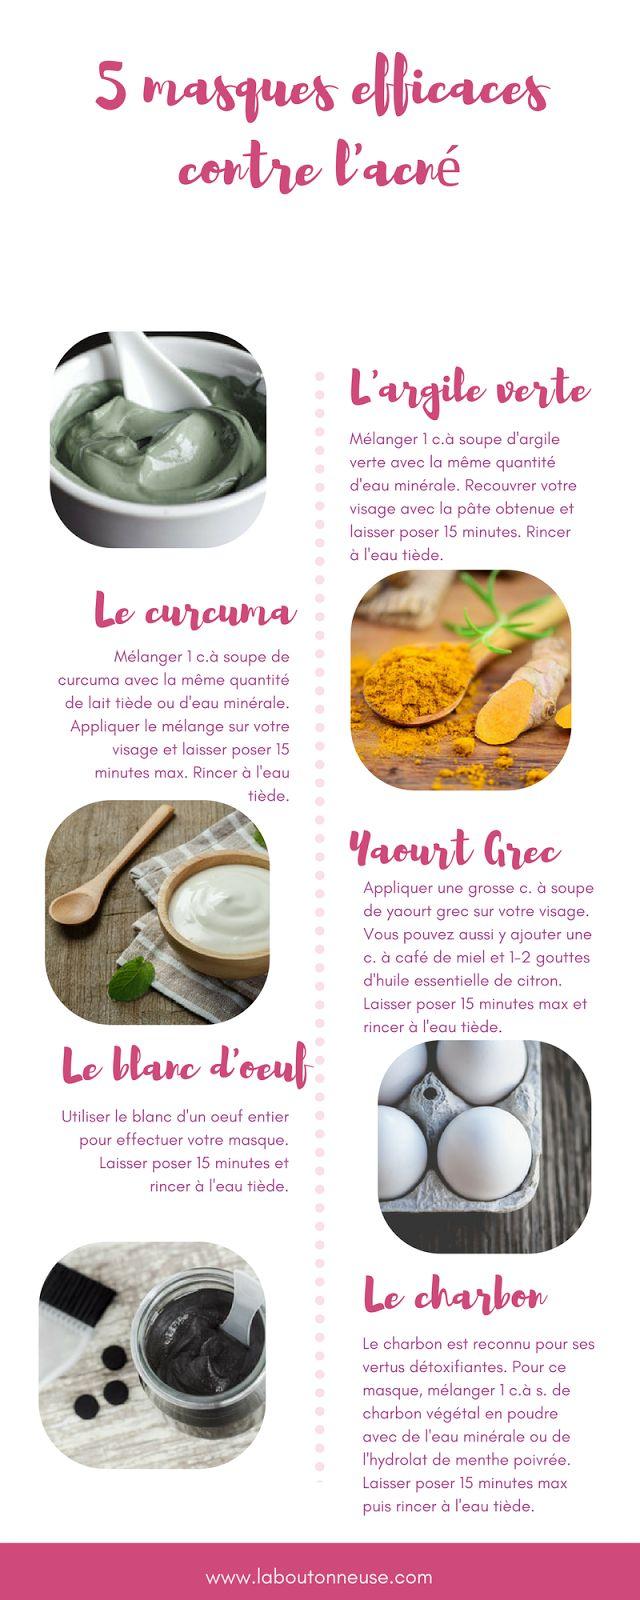 5 masques naturels efficaces contre l'acné (à petits prix)